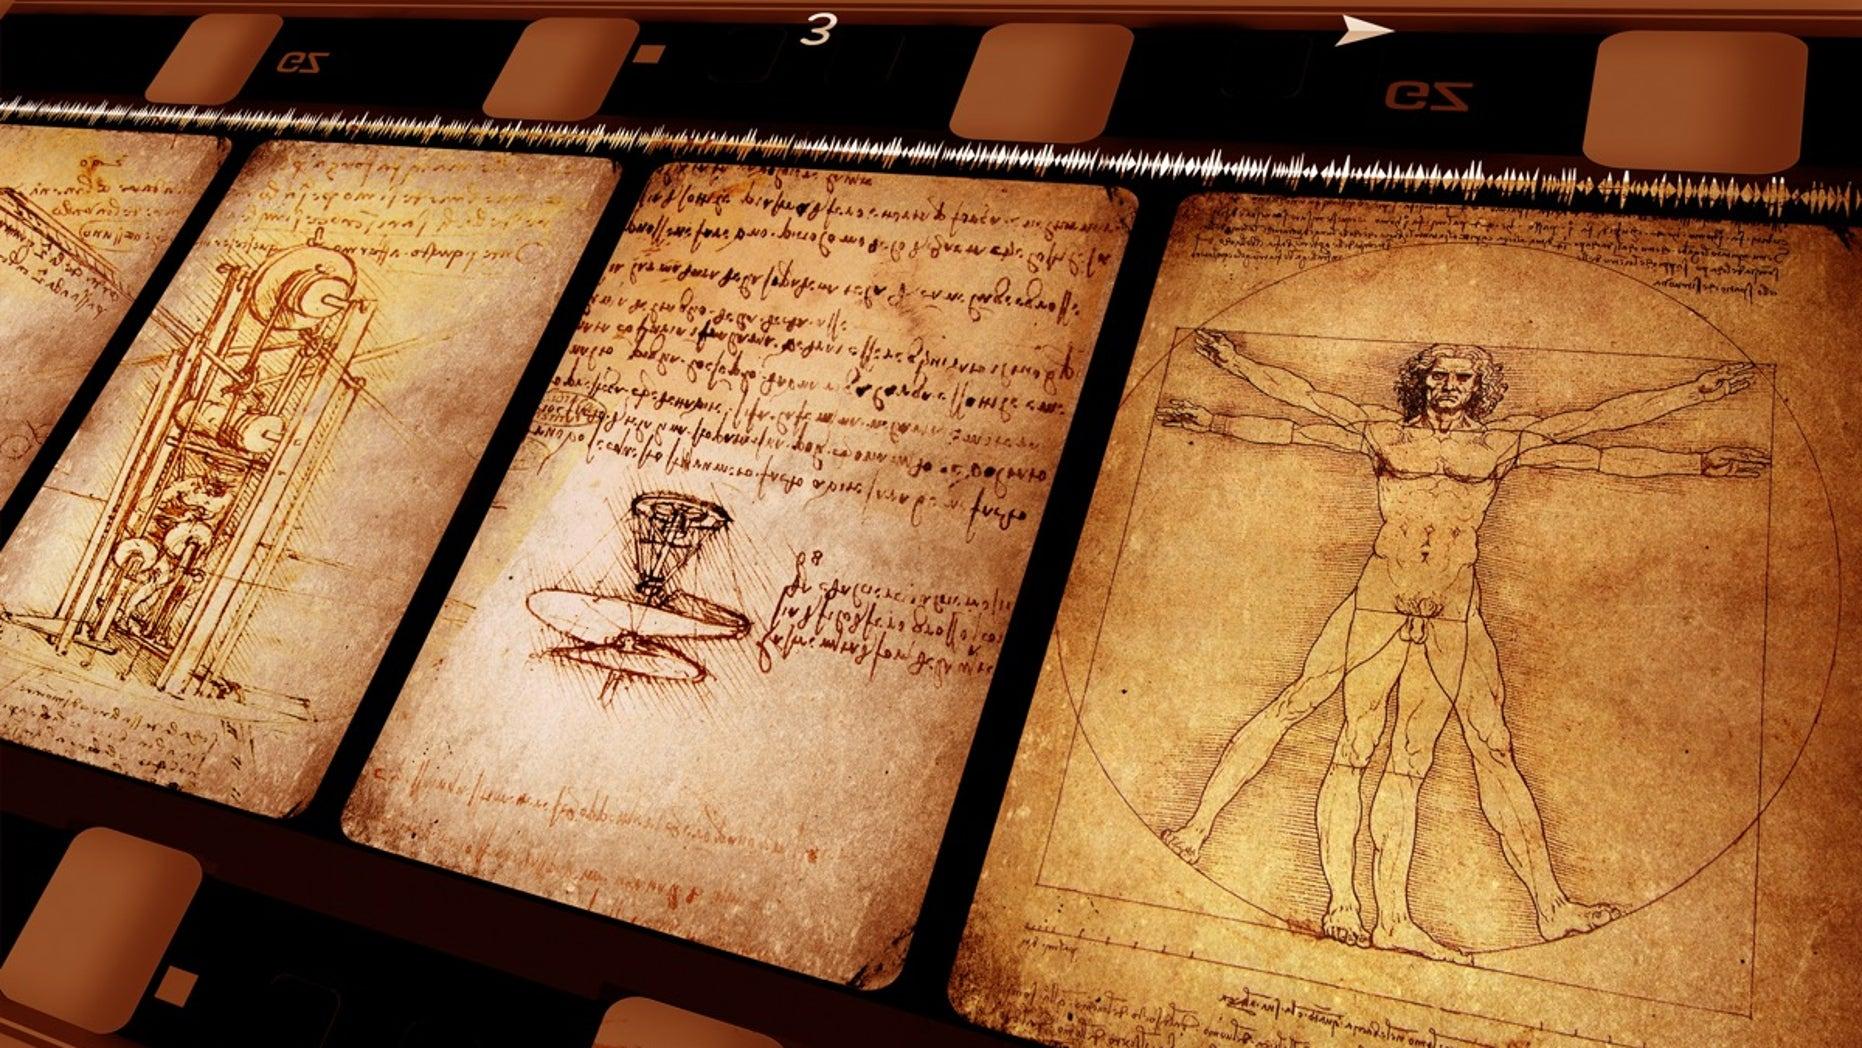 Leonardo da Vinci was both an inventor and artist during the Renaissance.